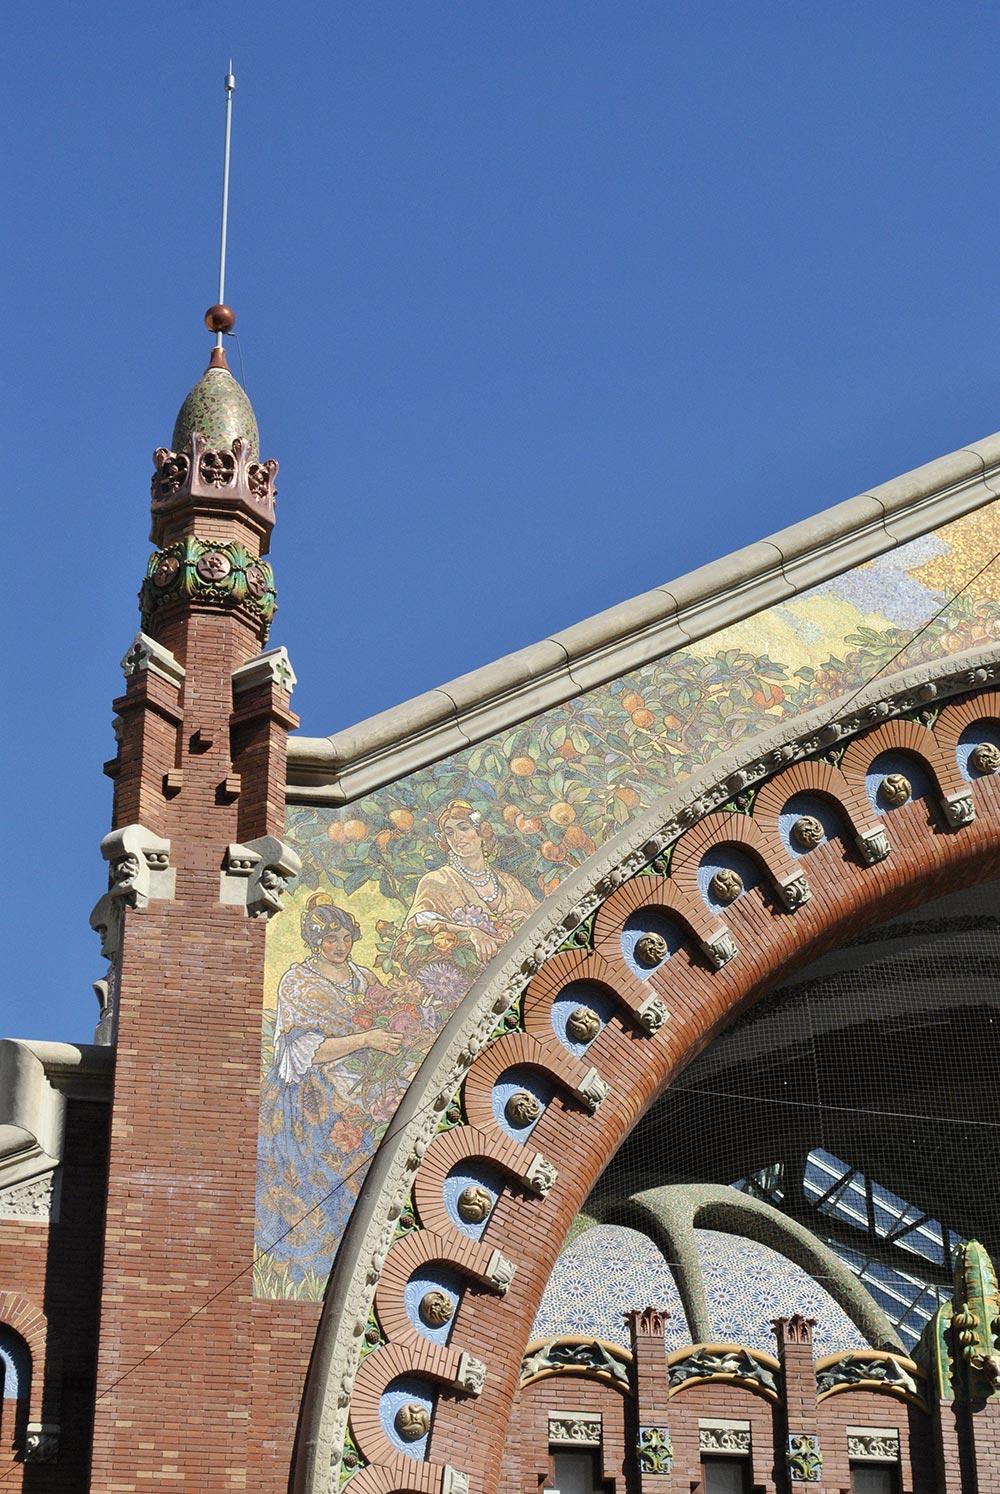 Rutas centro historico valencia, guided visit valencia